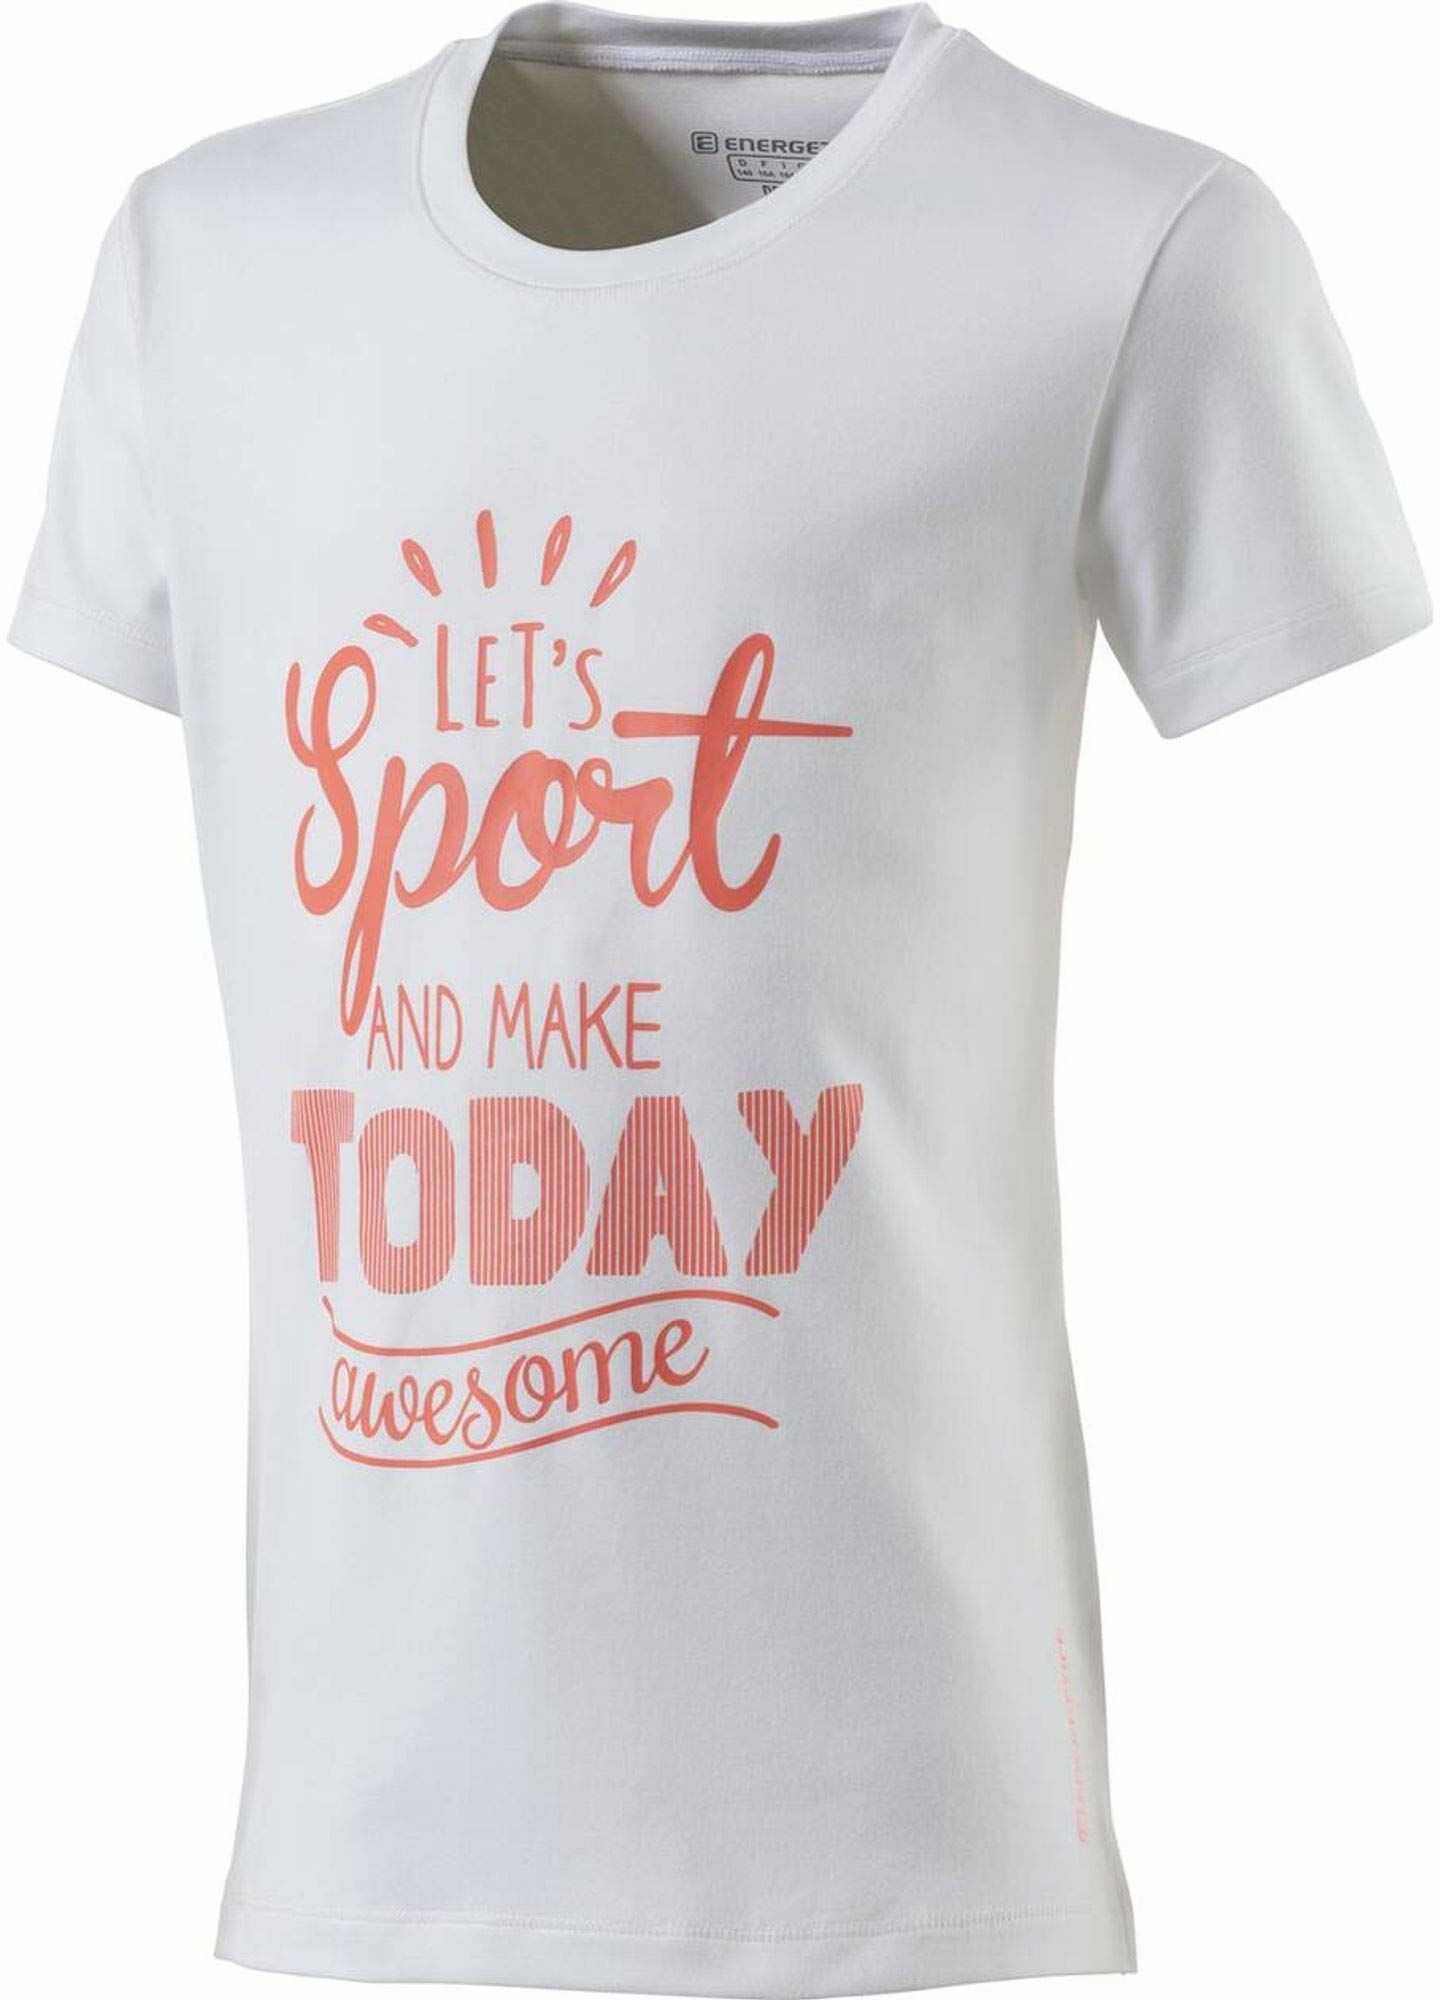 Energetics Gandalfa 3 T-shirt, White/Red Light, 128